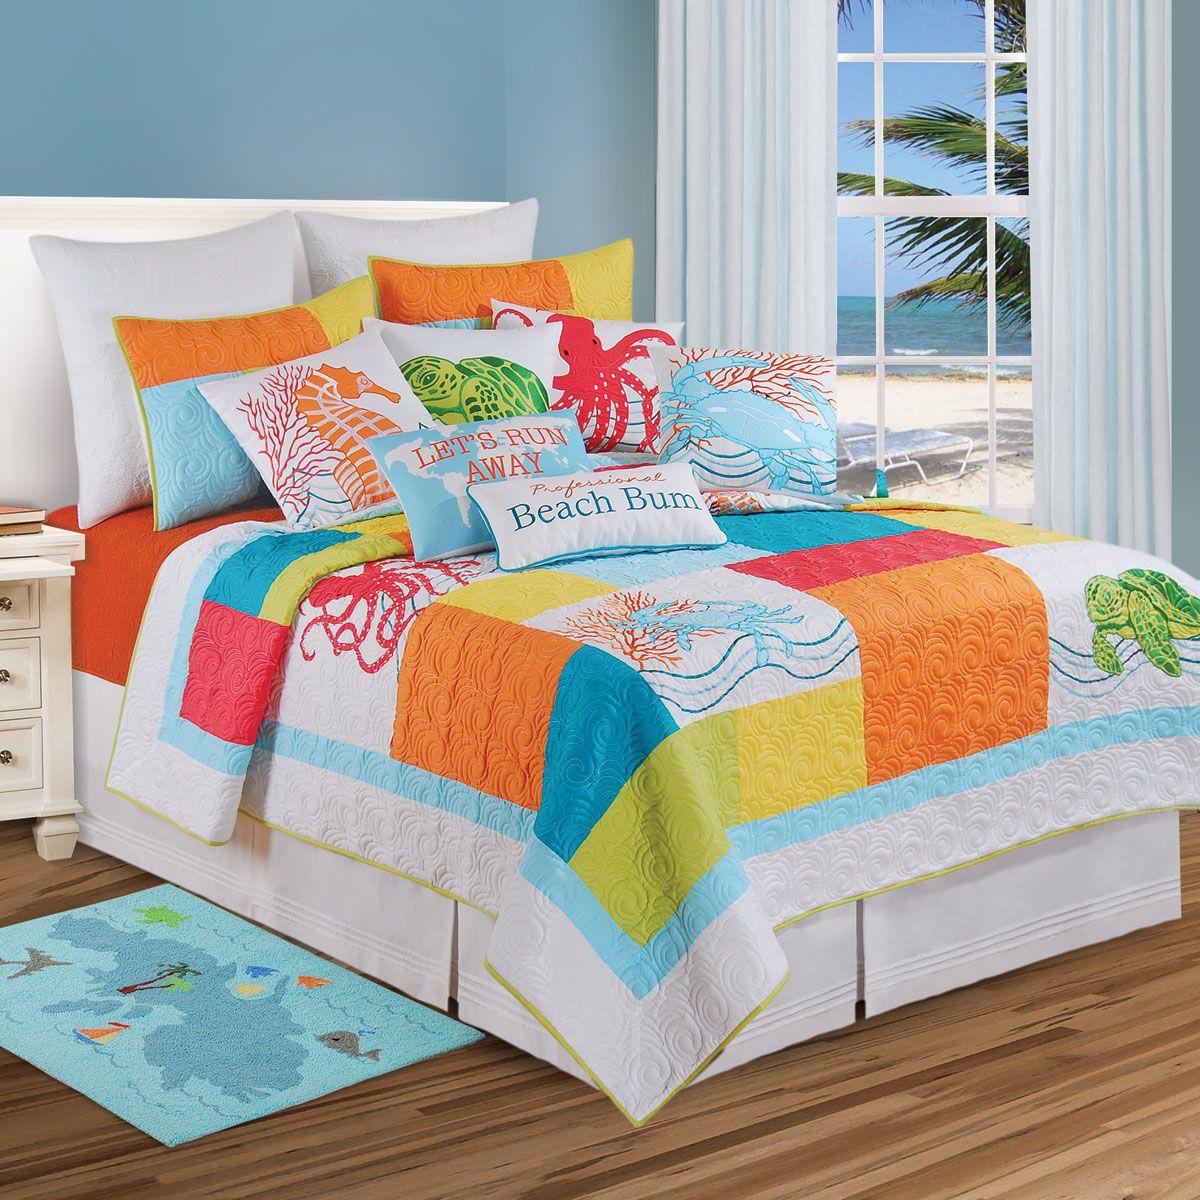 Caribbean Dreams Quilt Bedding Collection Bed Decor Coastal